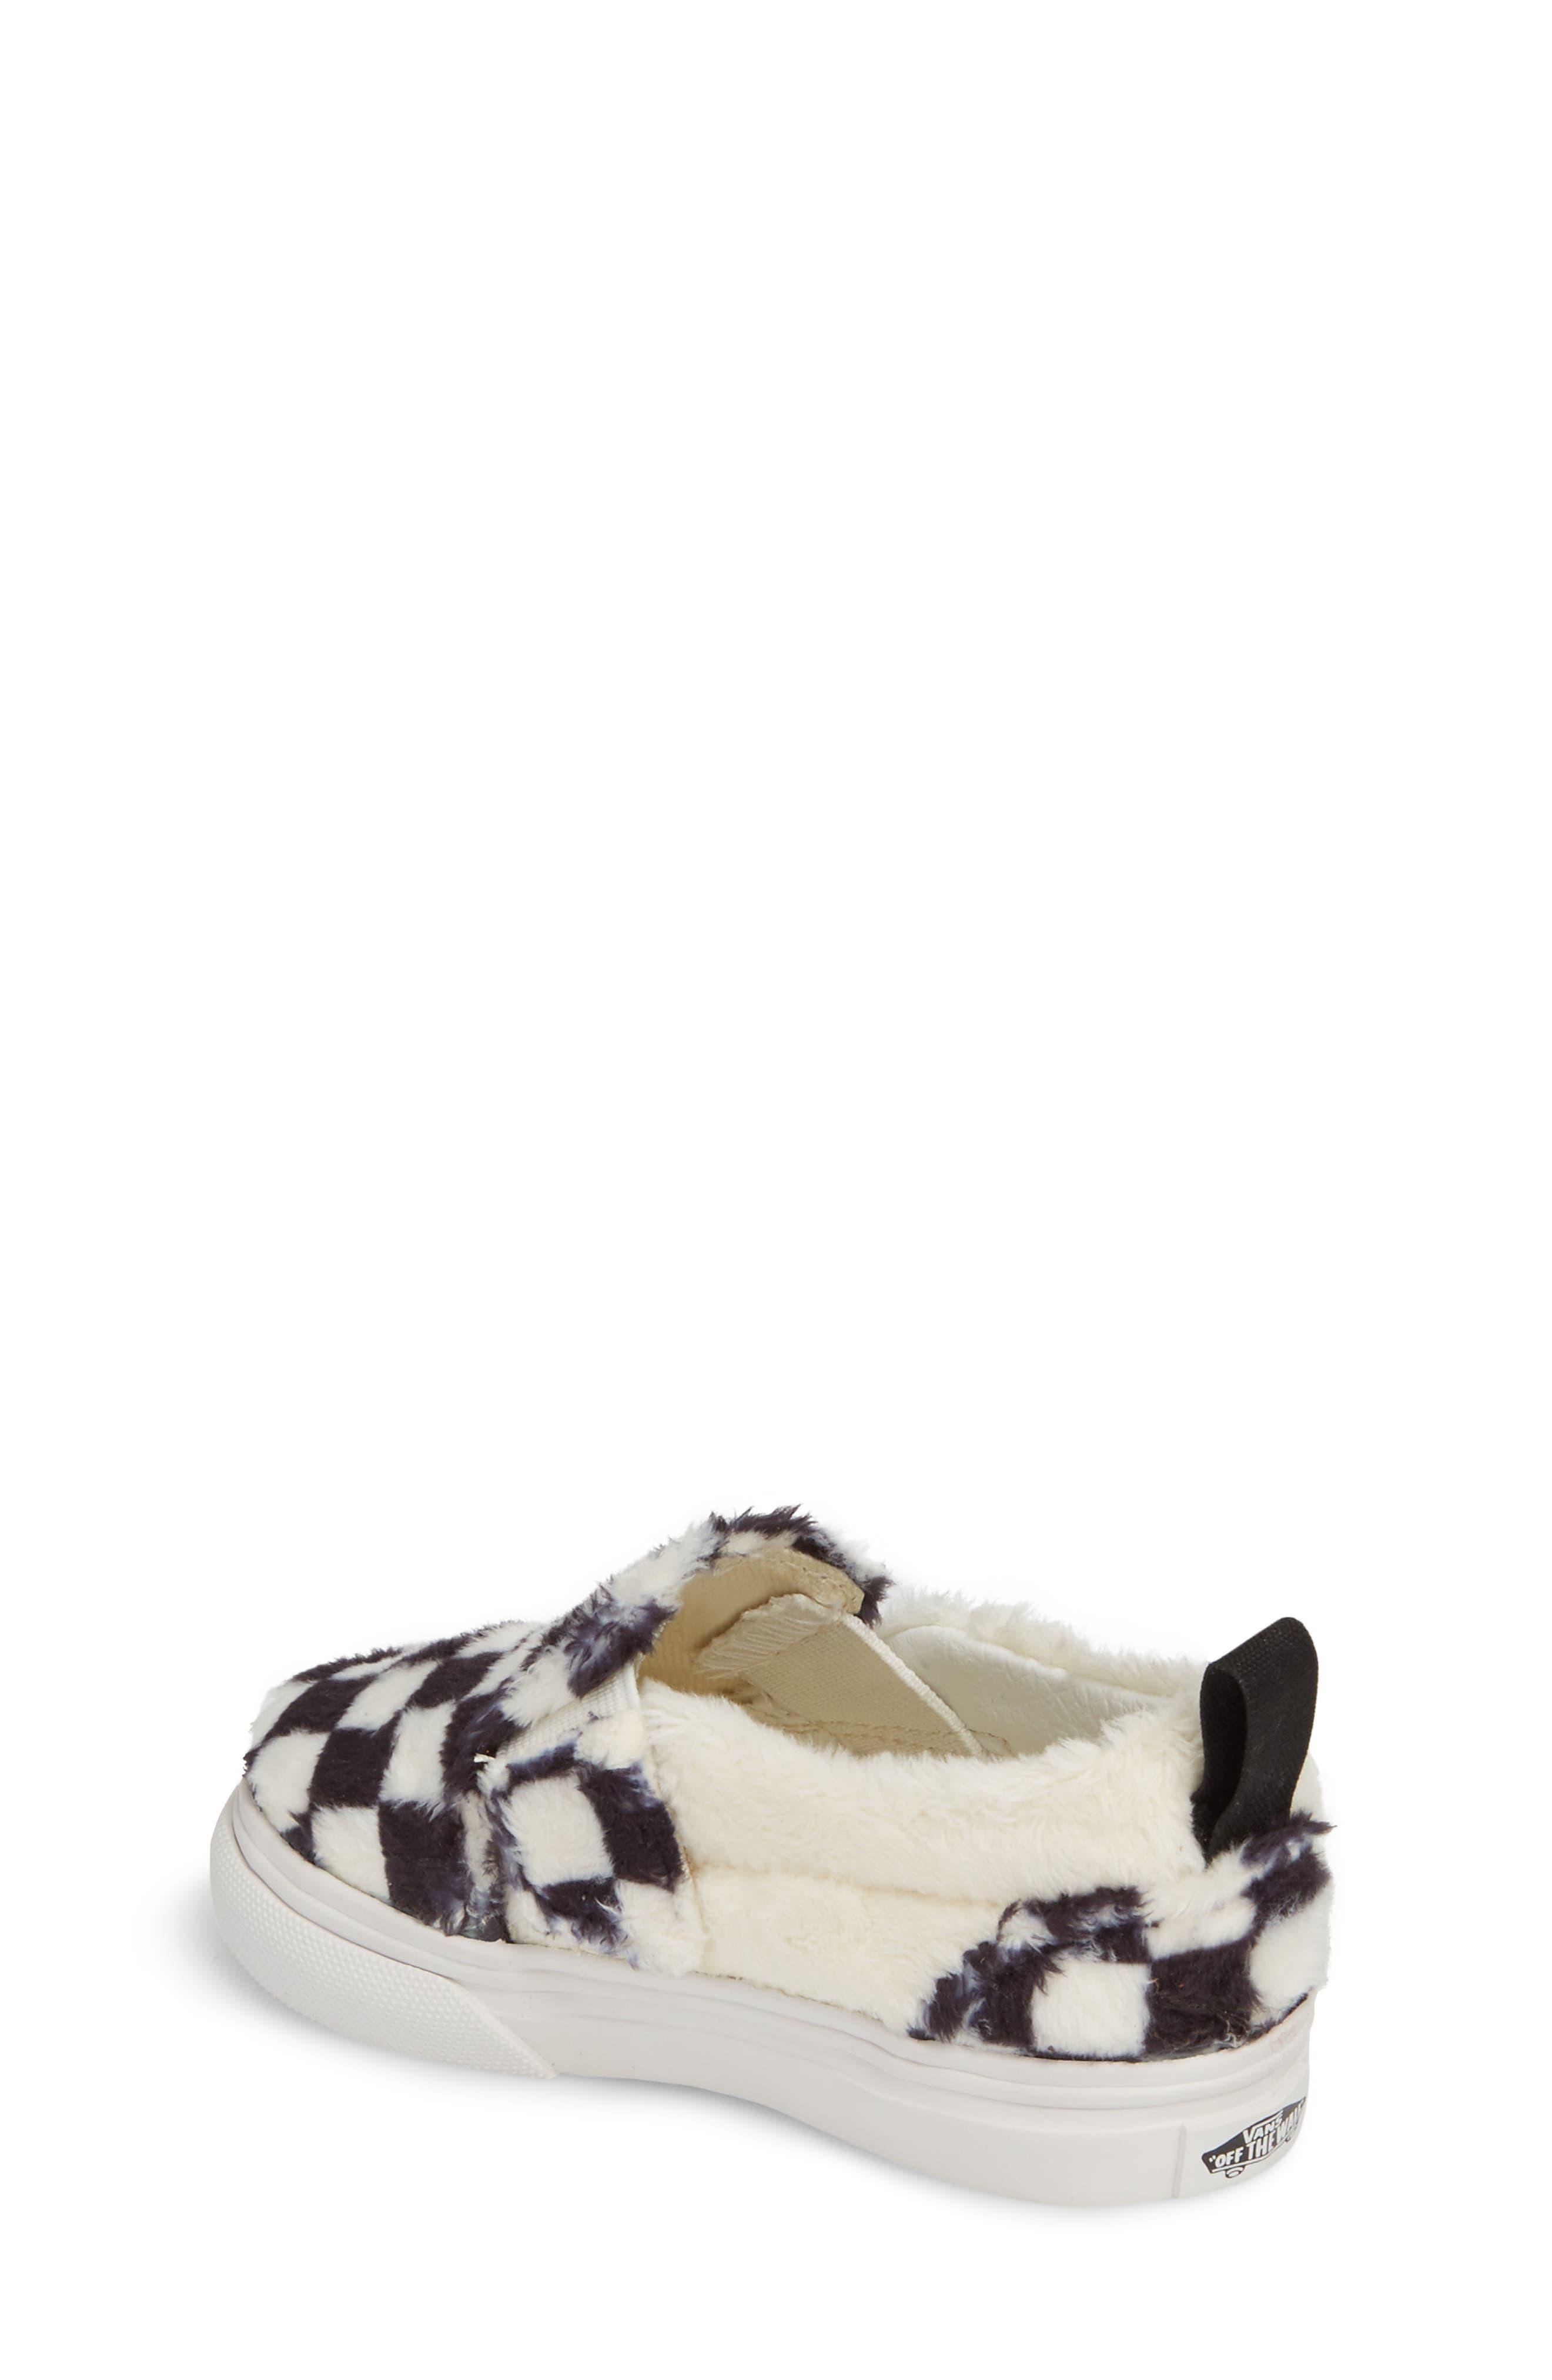 Faux Fur Slip-On Sneaker,                             Alternate thumbnail 2, color,                             Black/ White Sherpa Check